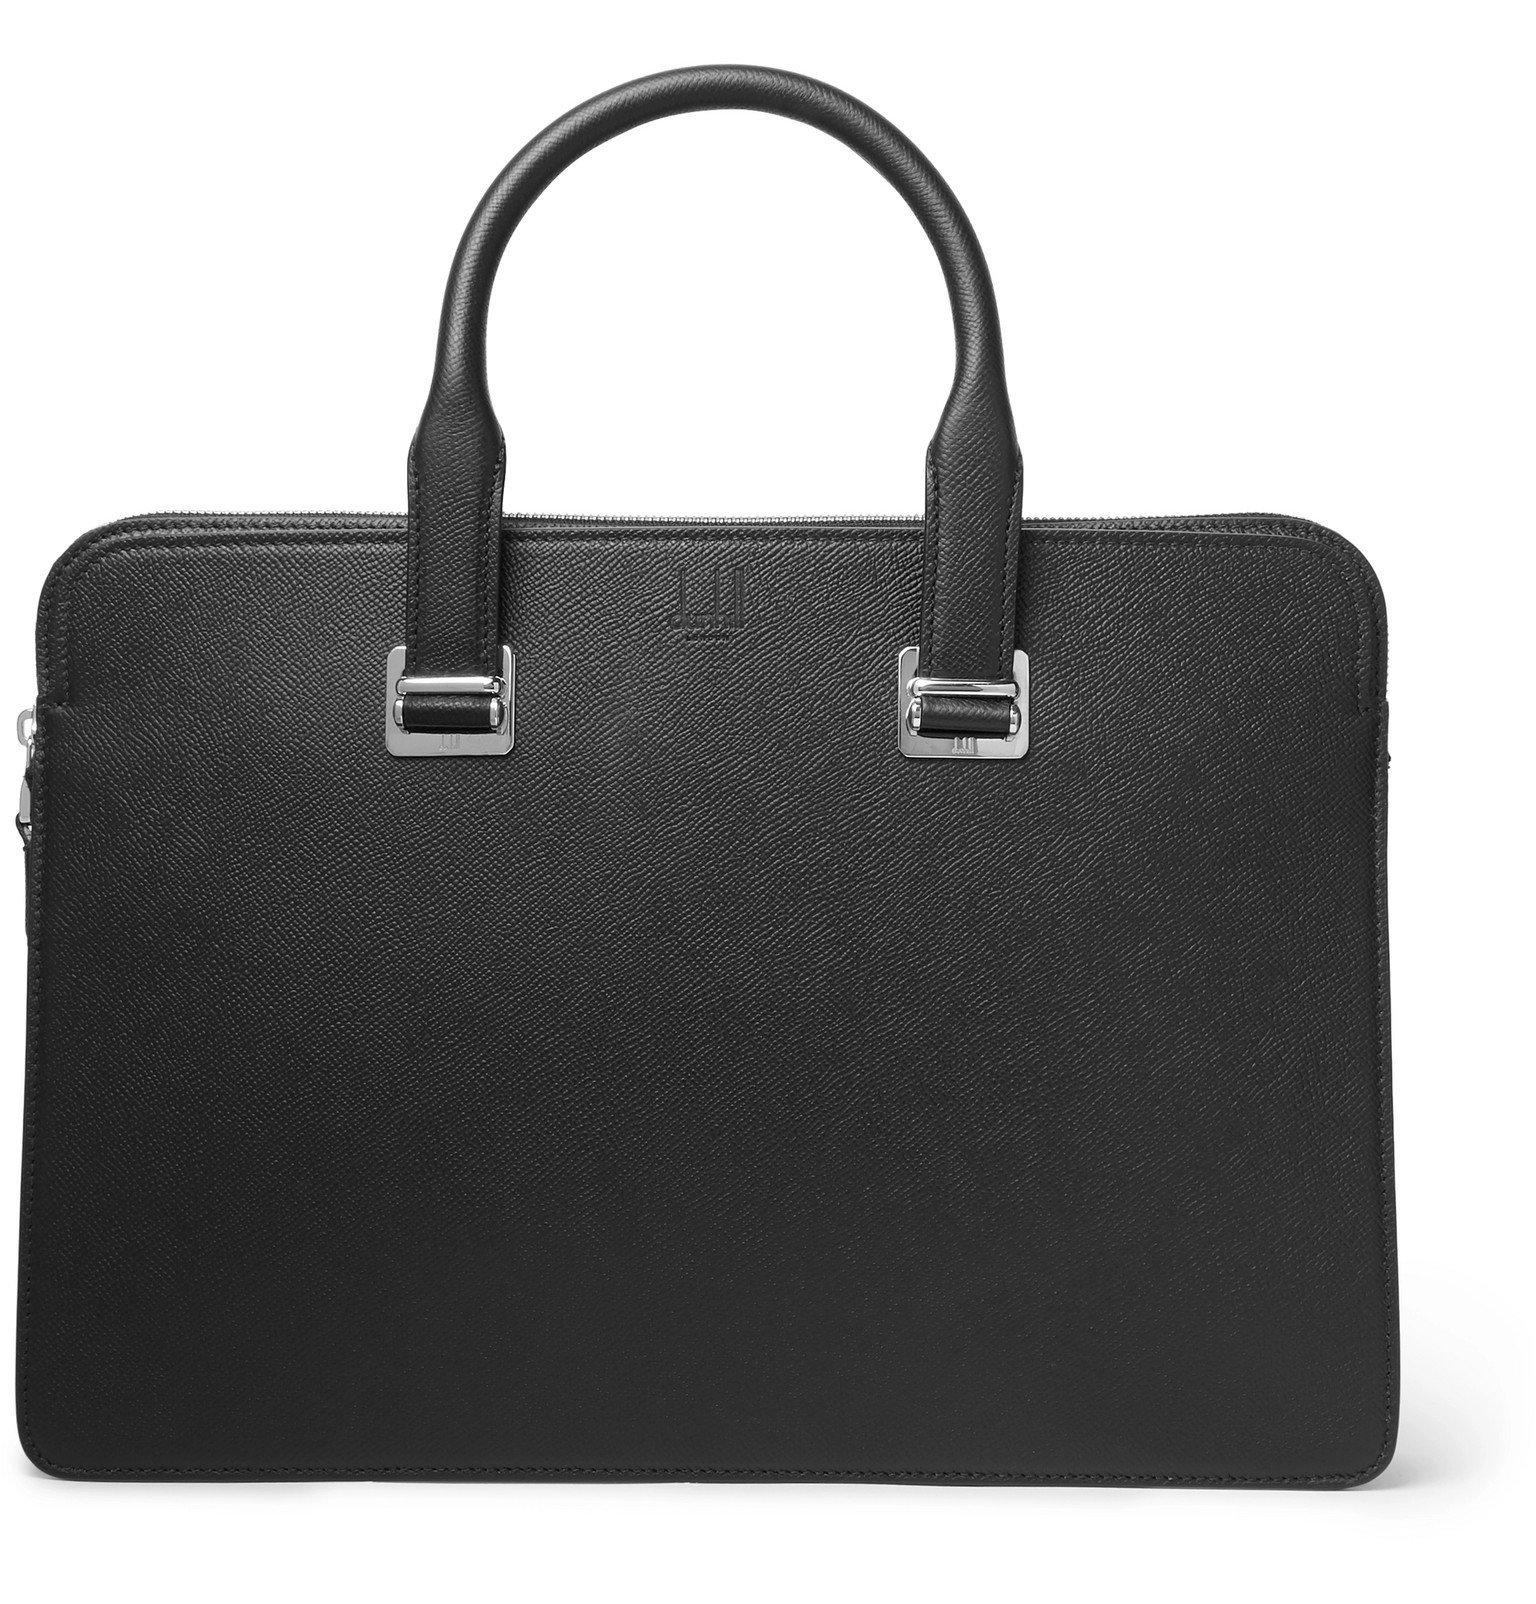 Dunhill - Cadogan Full-Grain Leather Briefcase - Black